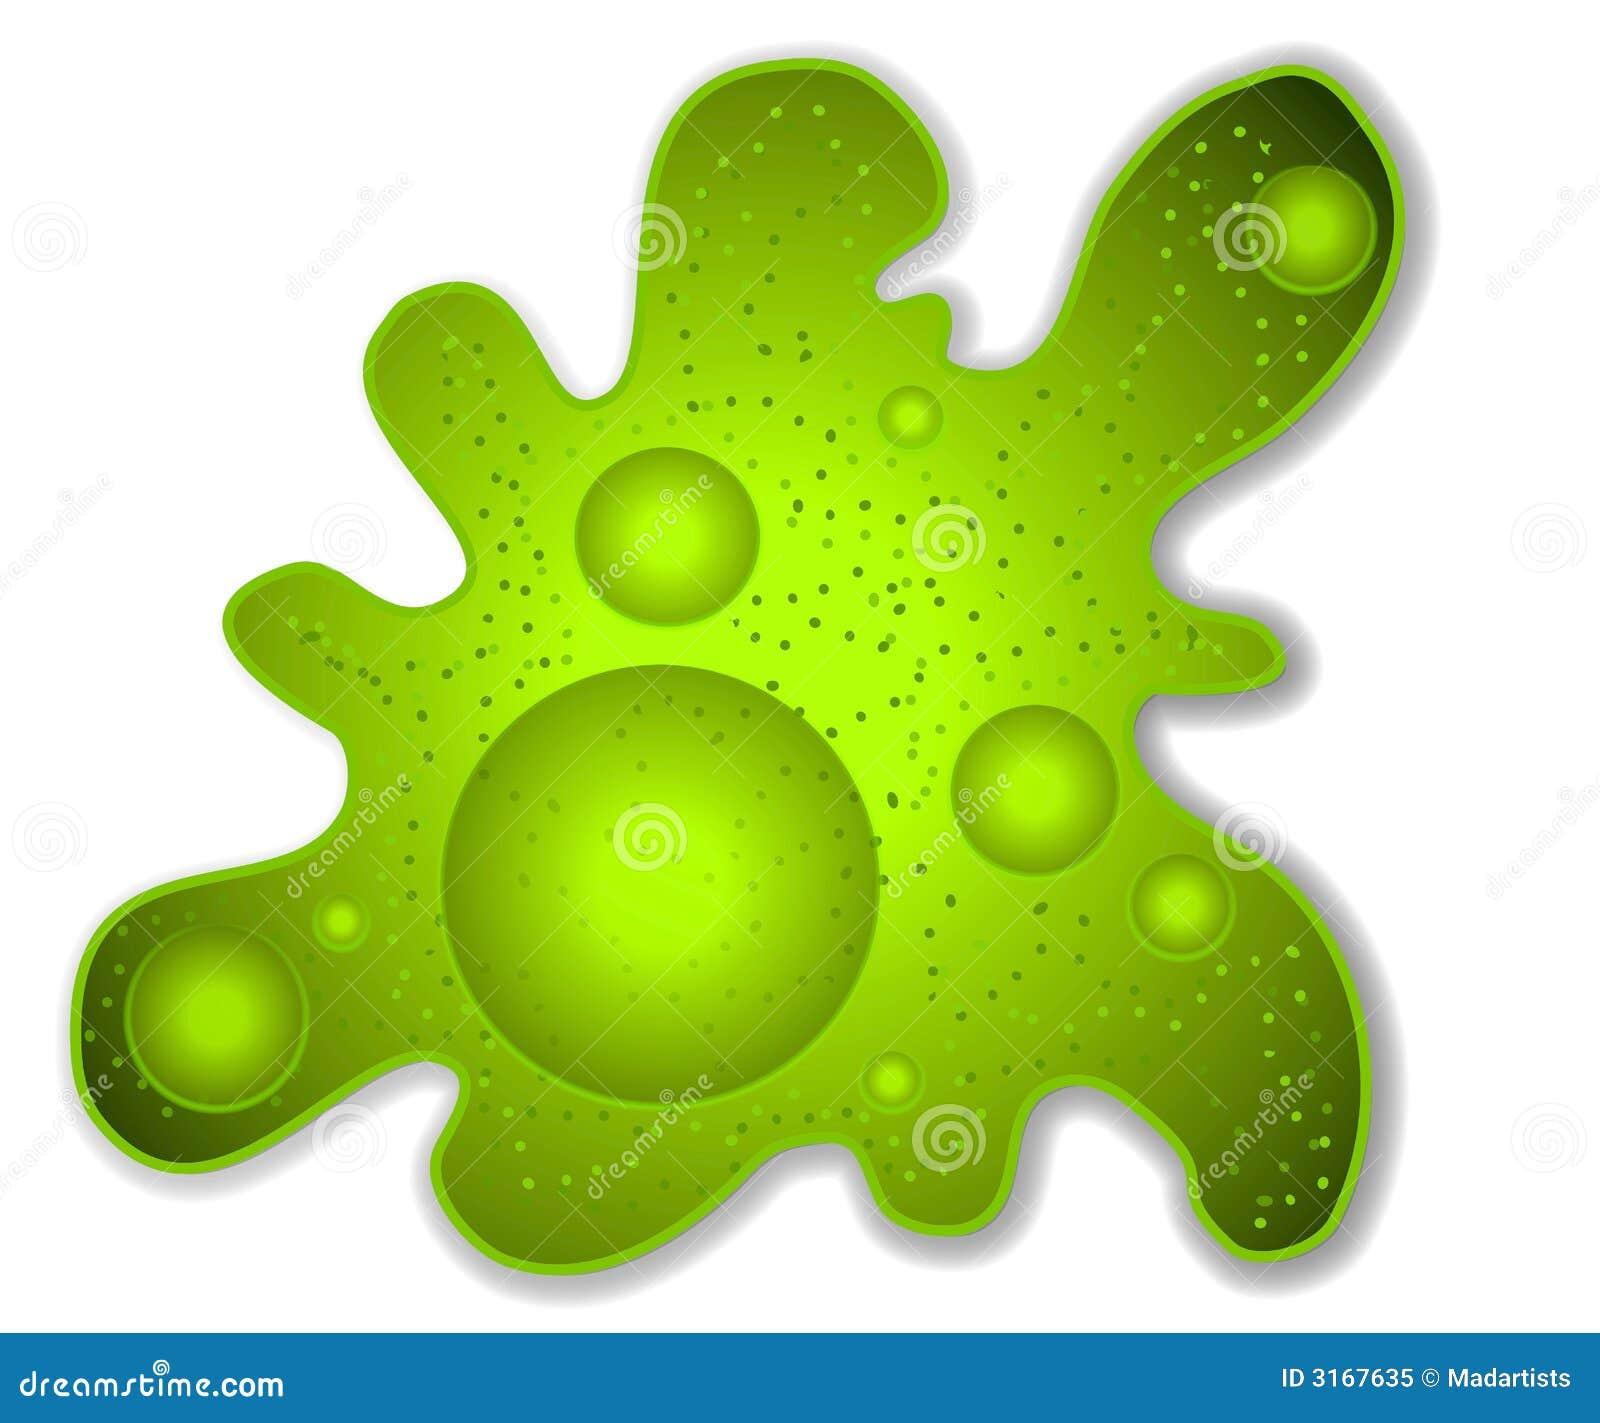 green amoeba microbe clip art stock illustration illustration of rh dreamstime com Dreamstime Girls On Bed dreamstime clipart